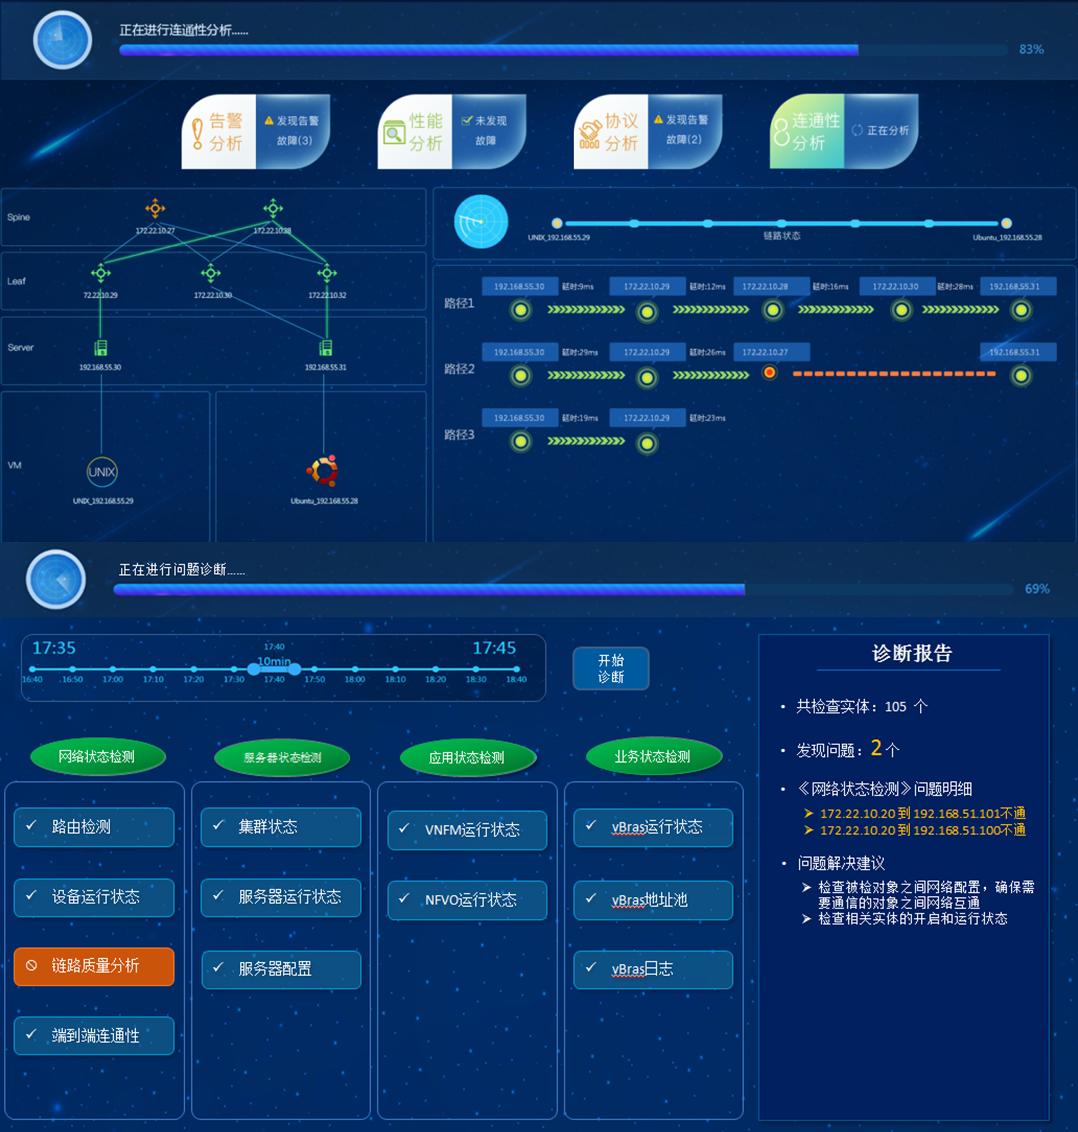 H3C AD-NET Director 加速SDN商业部署,助推企业数字化转型